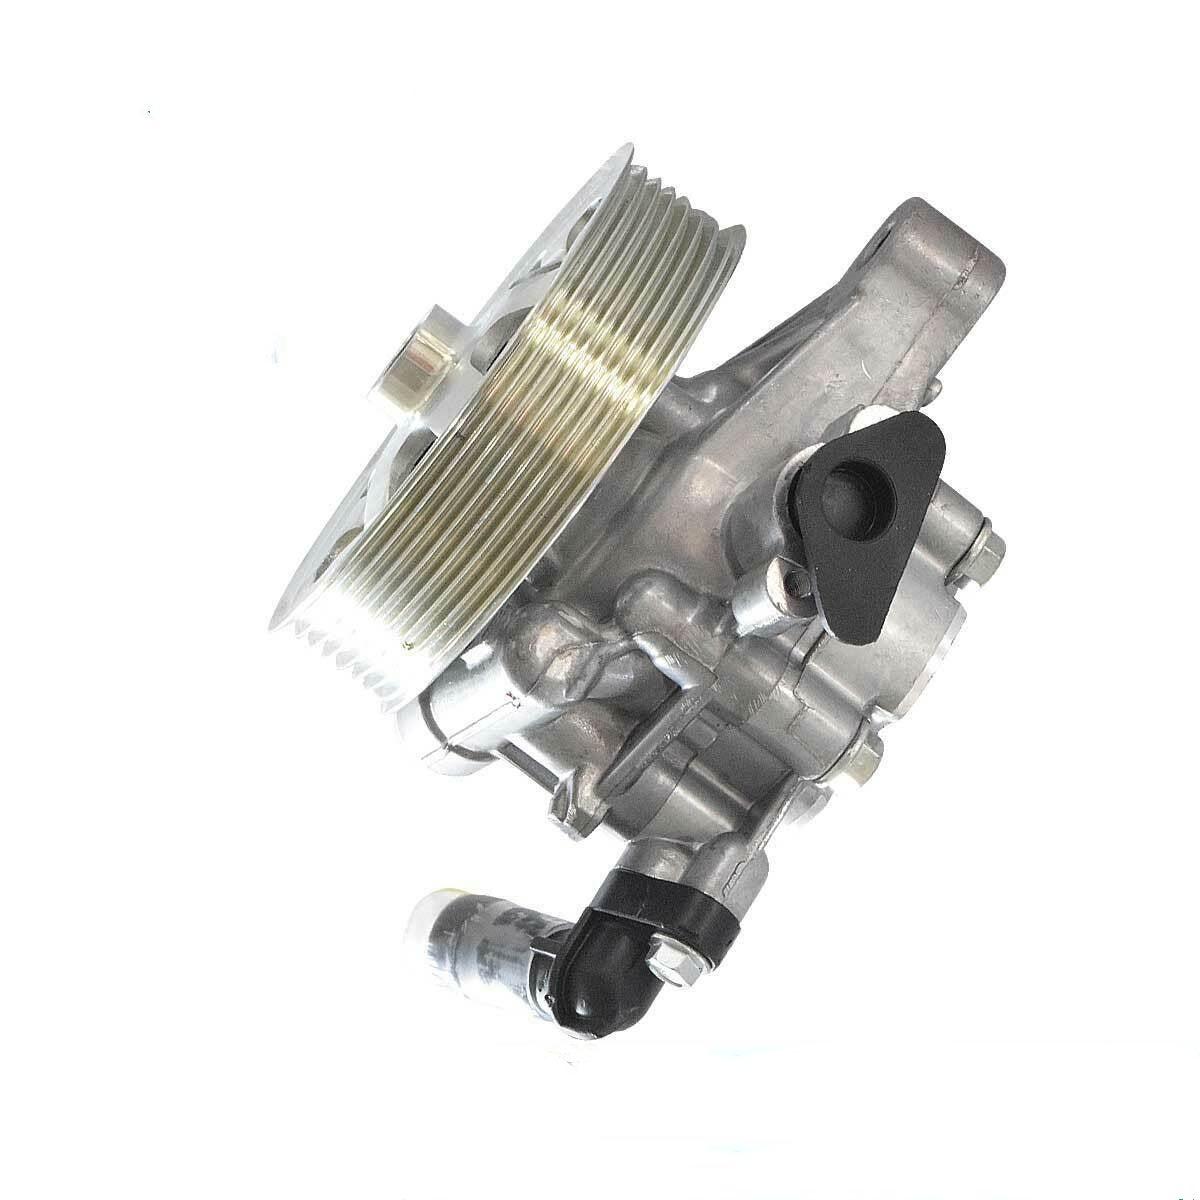 Power Steering Pump Fit For Honda Accord CP2 CS1 2.4L Petrol K24Z2 K24Z3 2008-2012